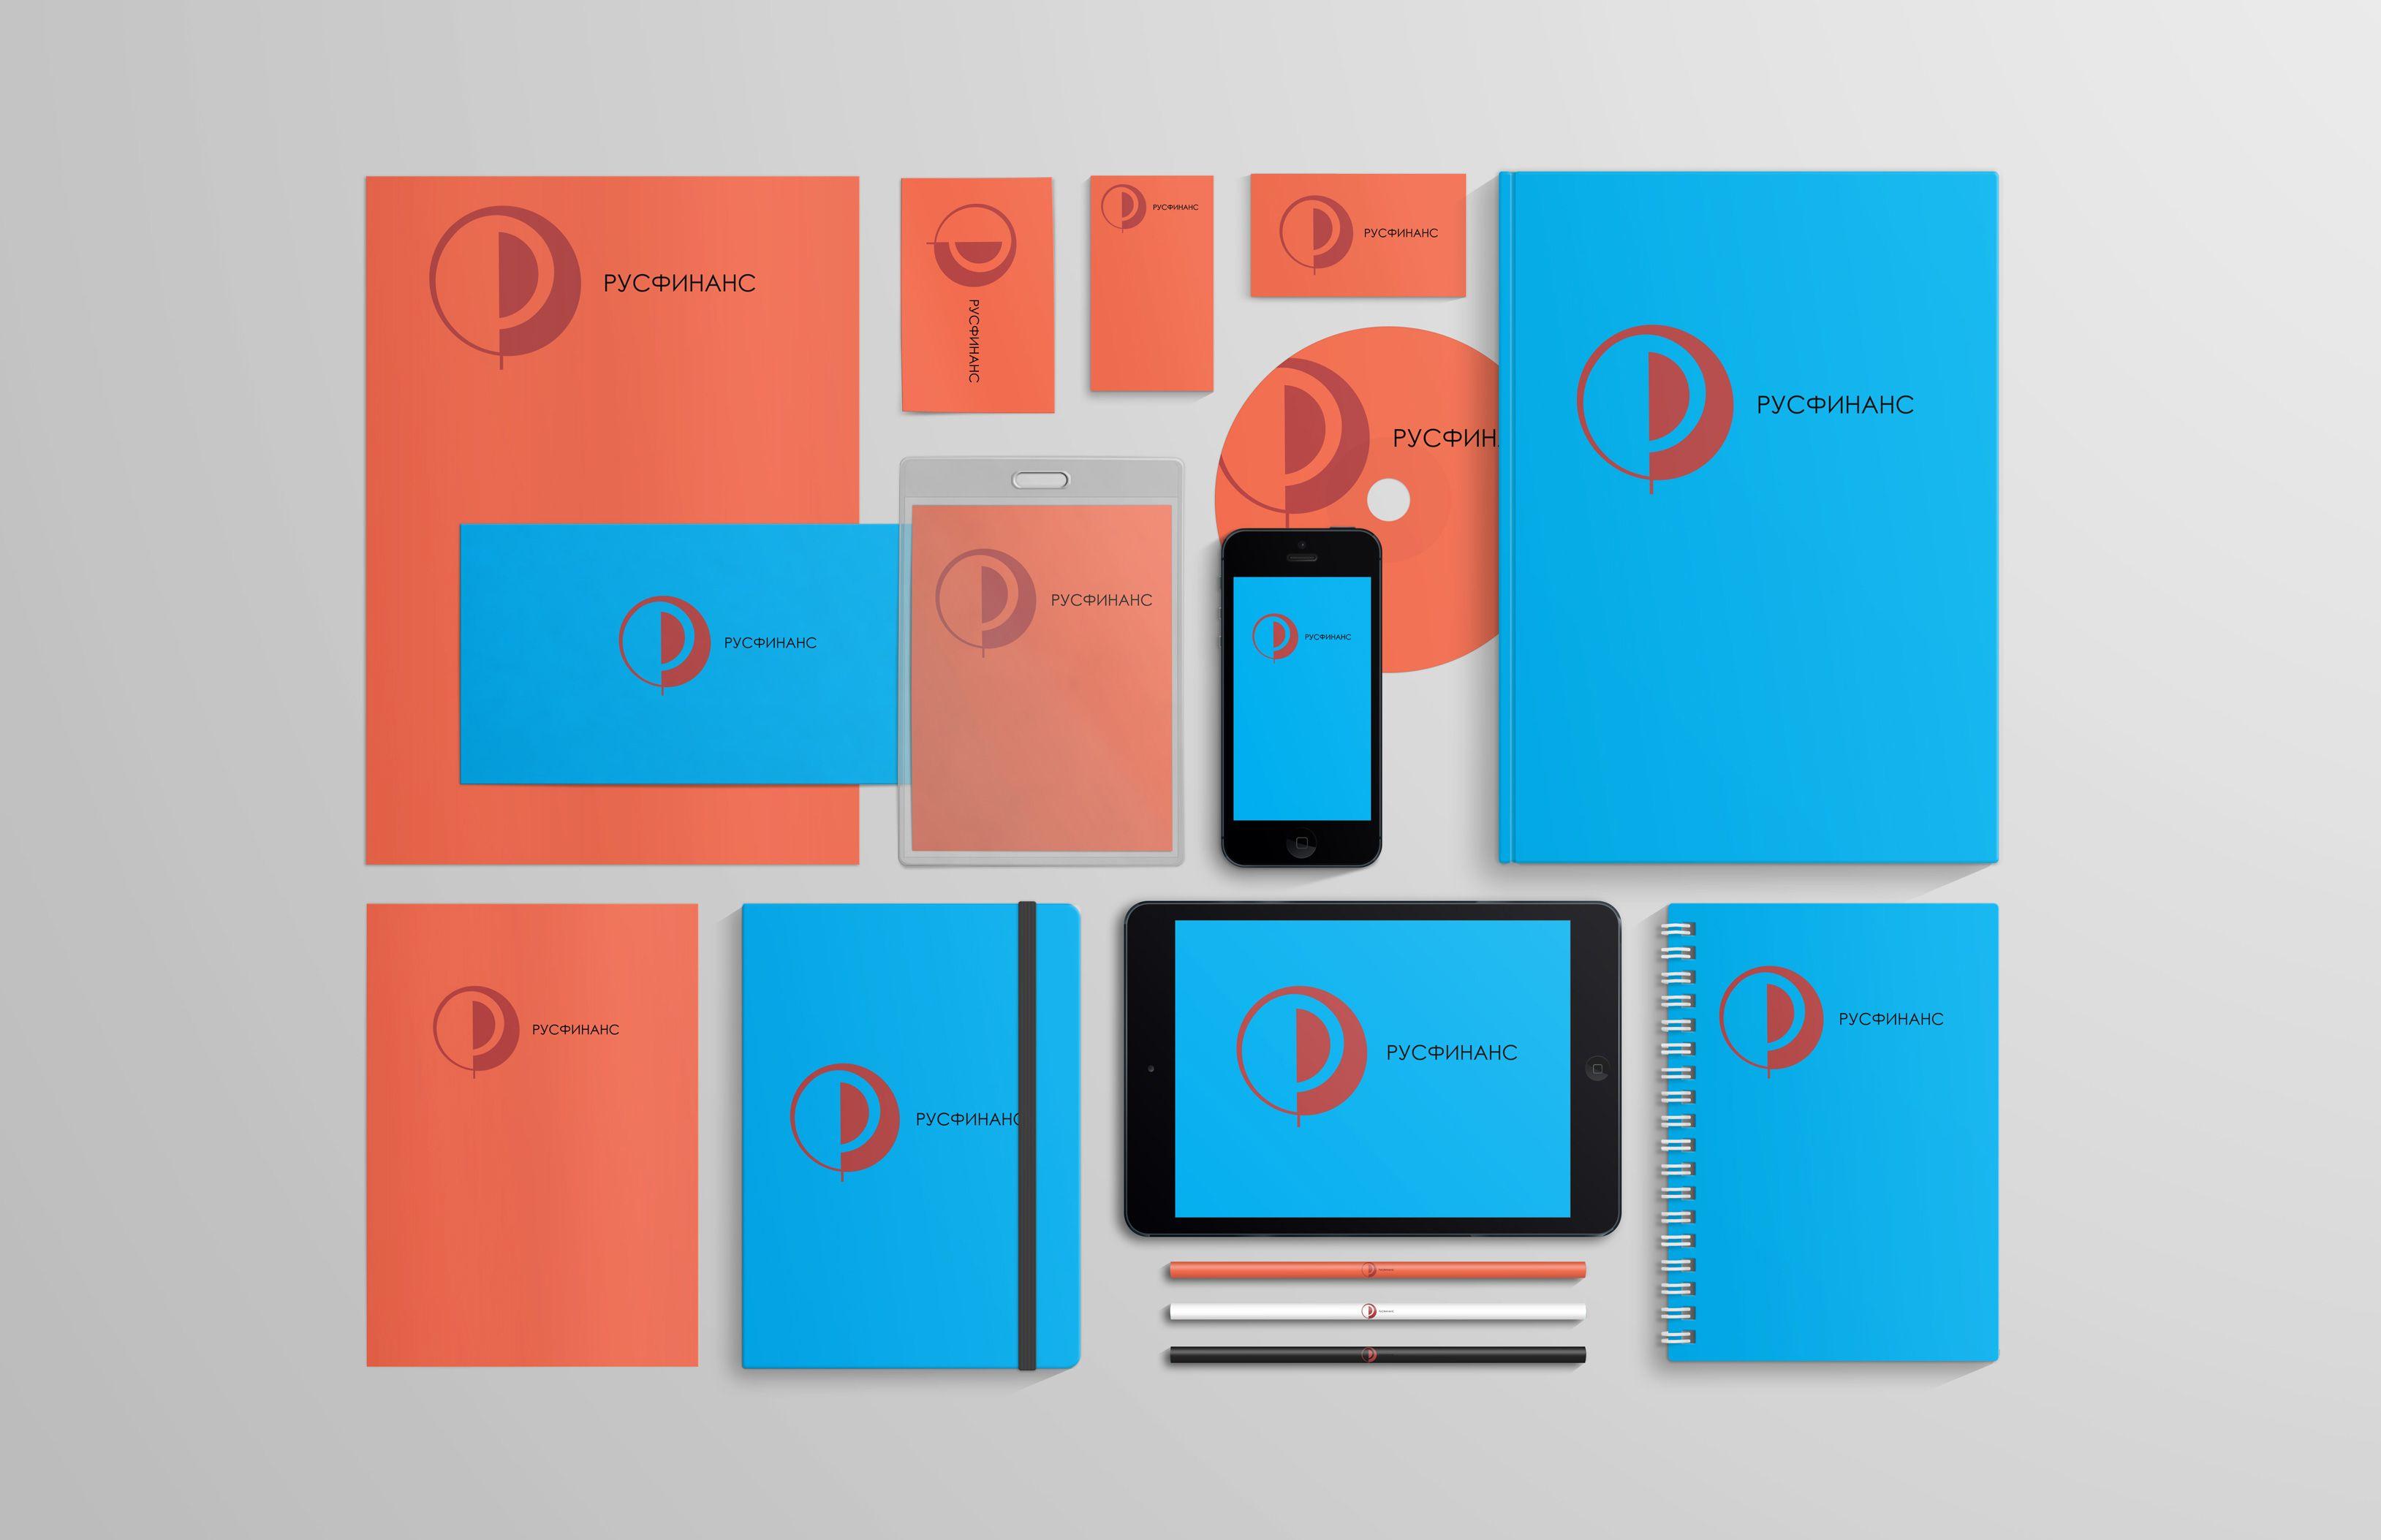 Логотип для Русфинанс - дизайнер give_5